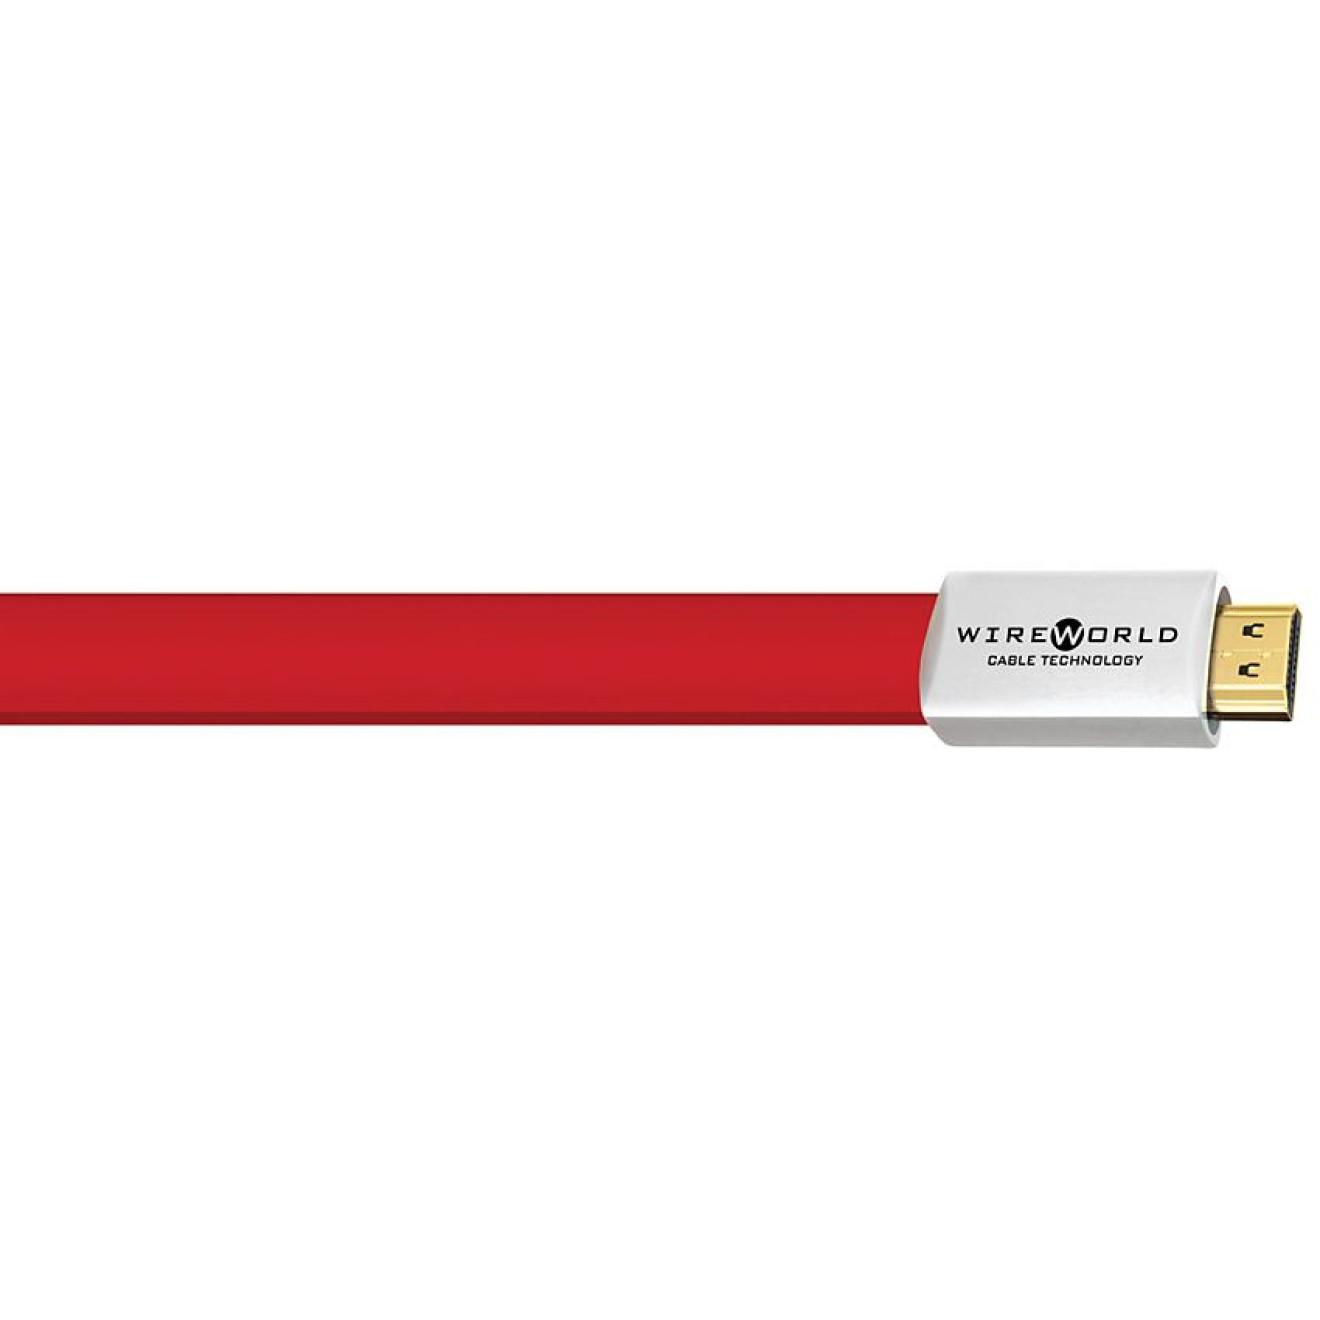 Wireworld Starlight 7 HDMI Kabel, Highend-Audiokabel.de | HiFi Kabel ...